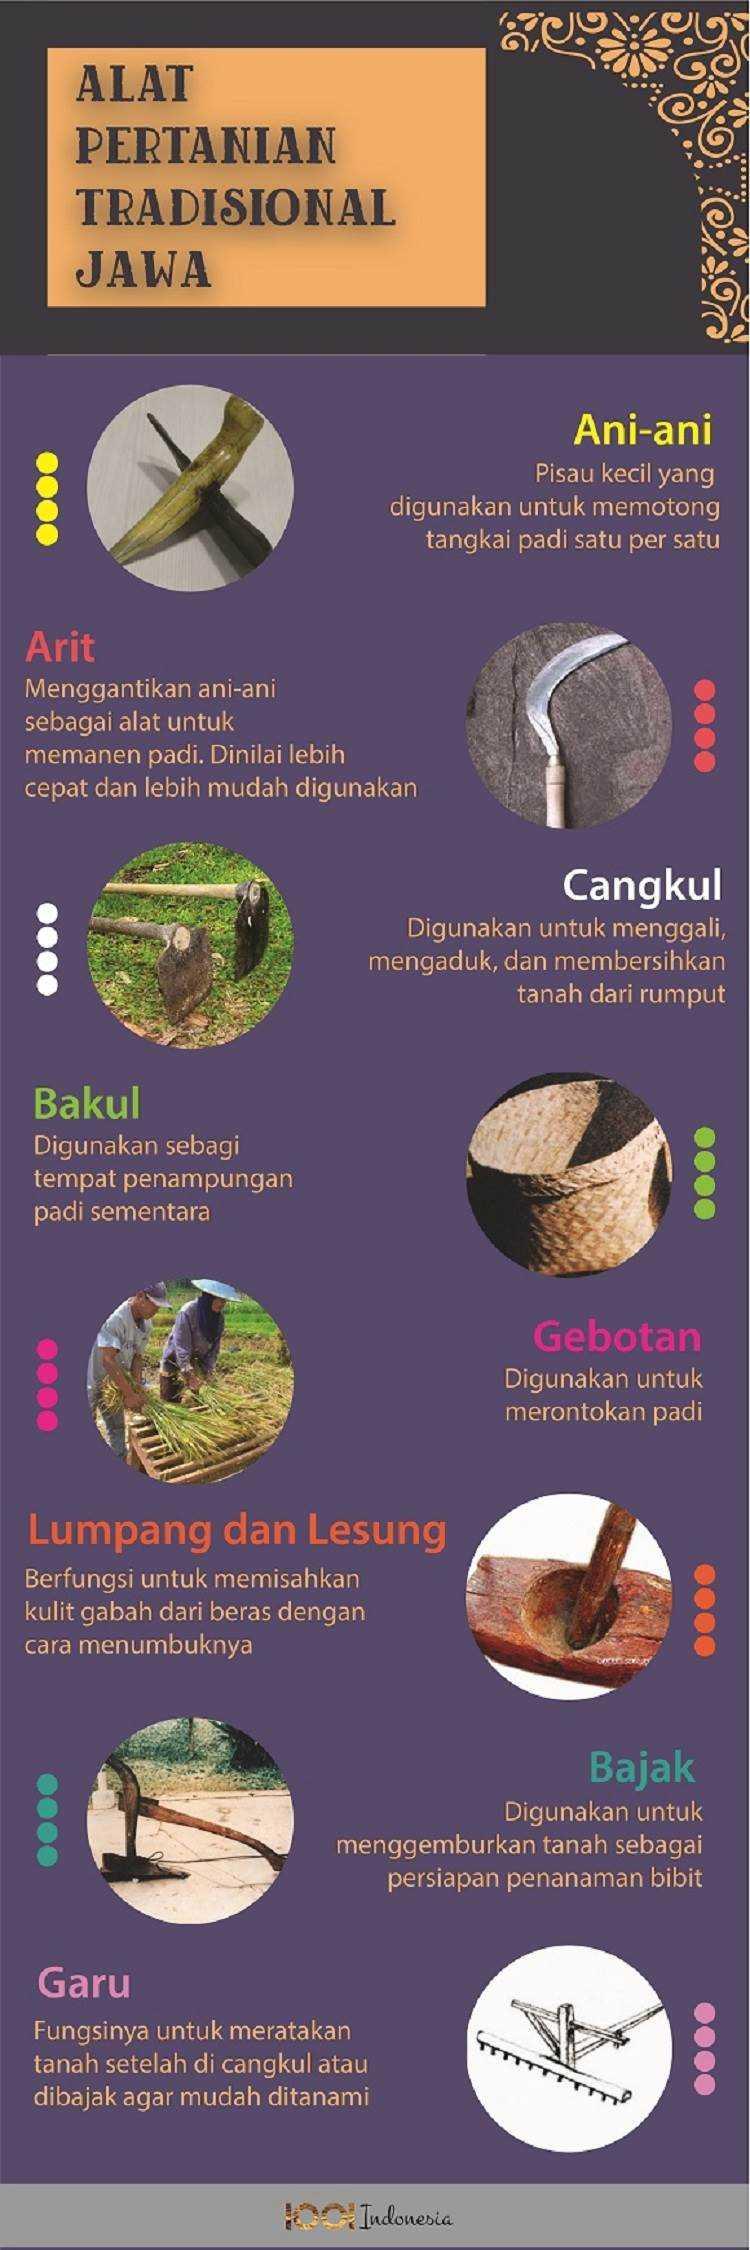 Alat Pertanian Tradisional Jawa